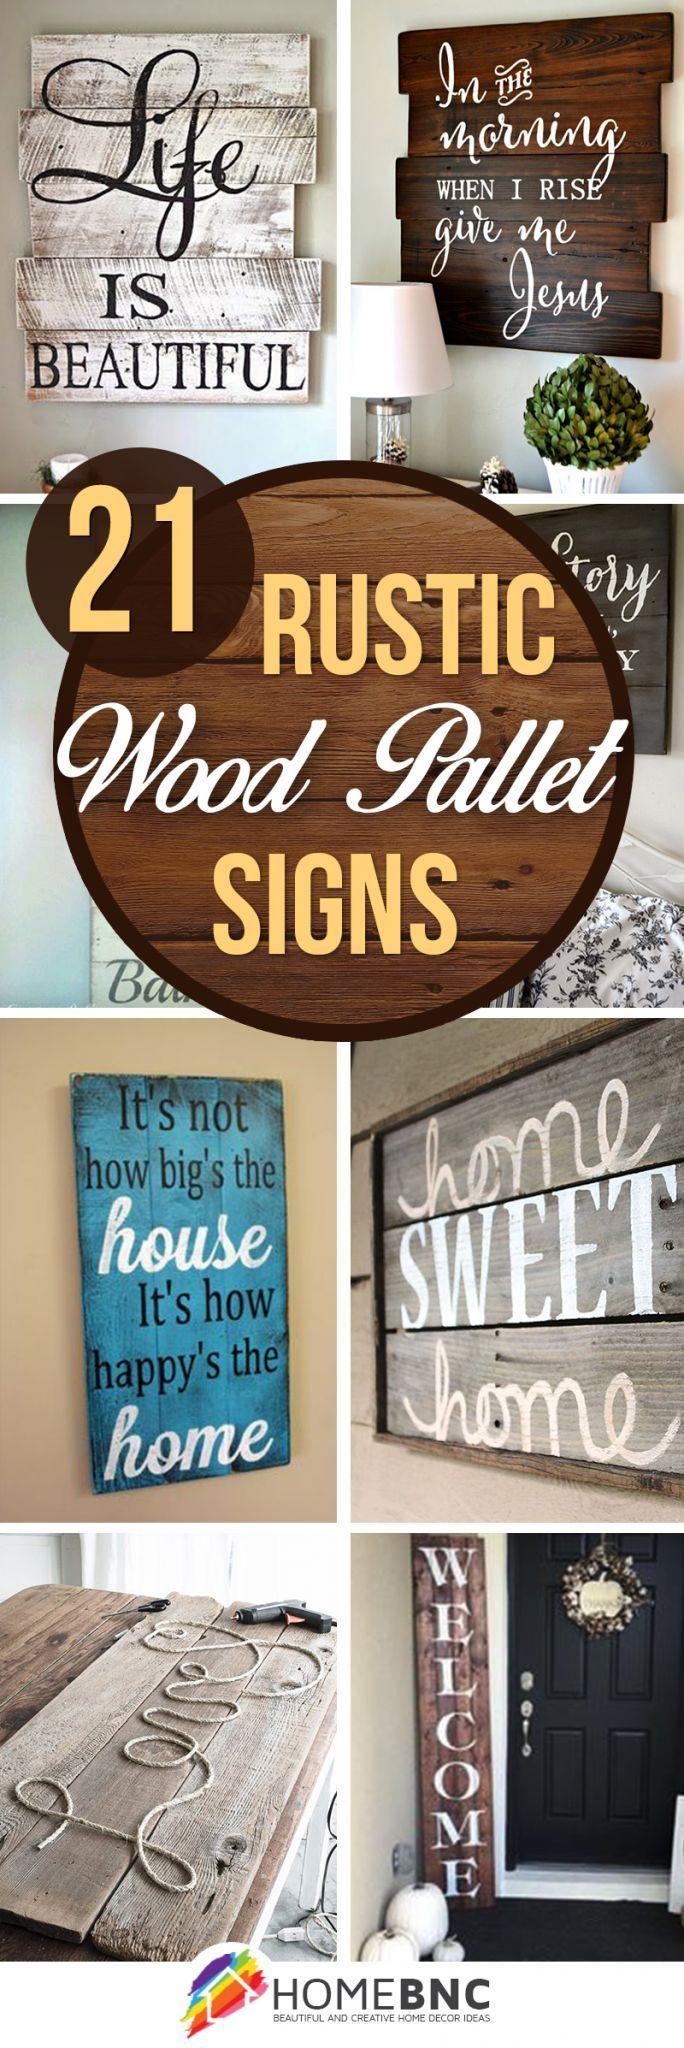 Wood Sign Ideas